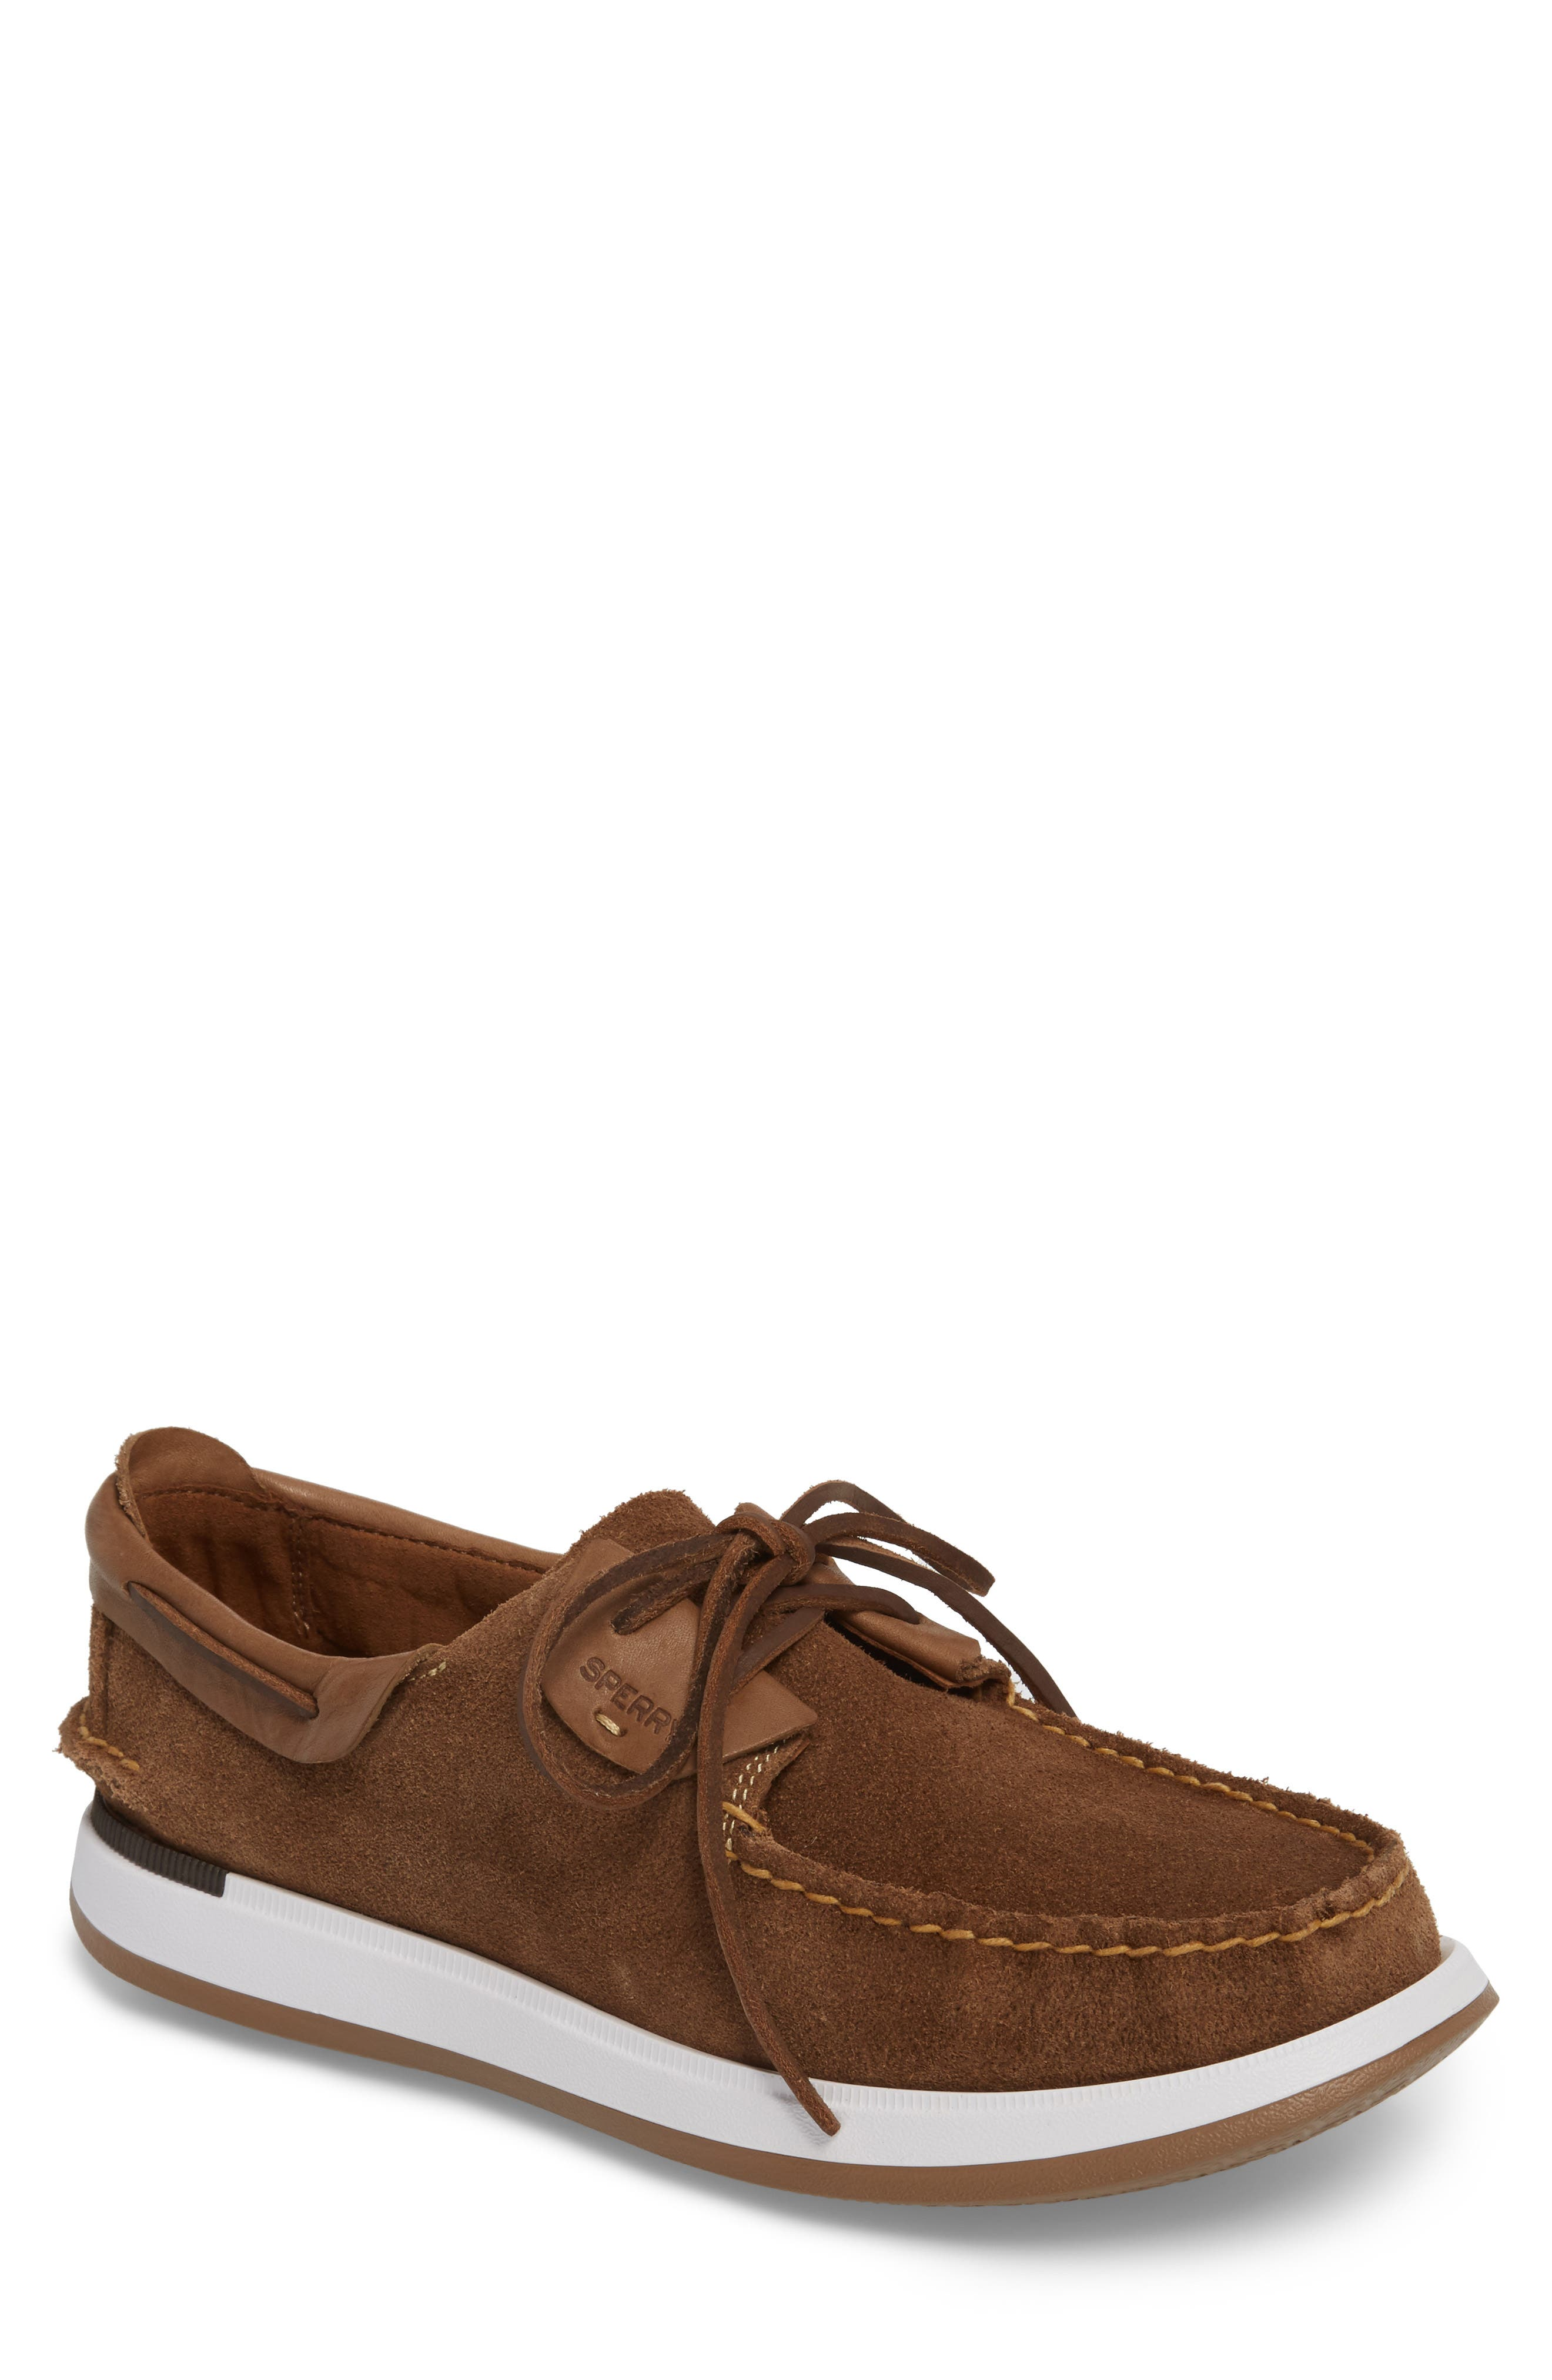 Caspian Boat Shoe,                         Main,                         color, Tan Leather/ Suede